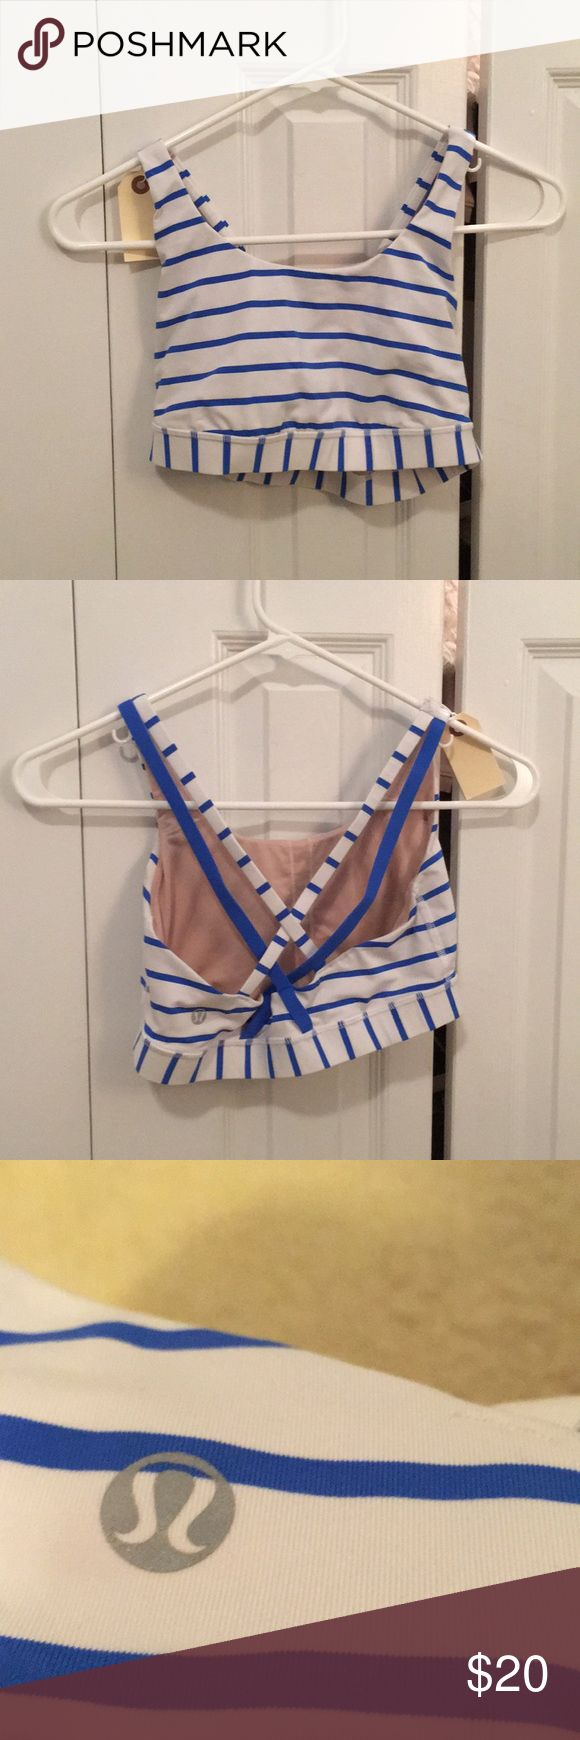 Lululemon blue & white stripe sports bra sz6 56616 Blue and white striped sports bra sz 6 pre loved lululemon athletica Tops Tank Tops